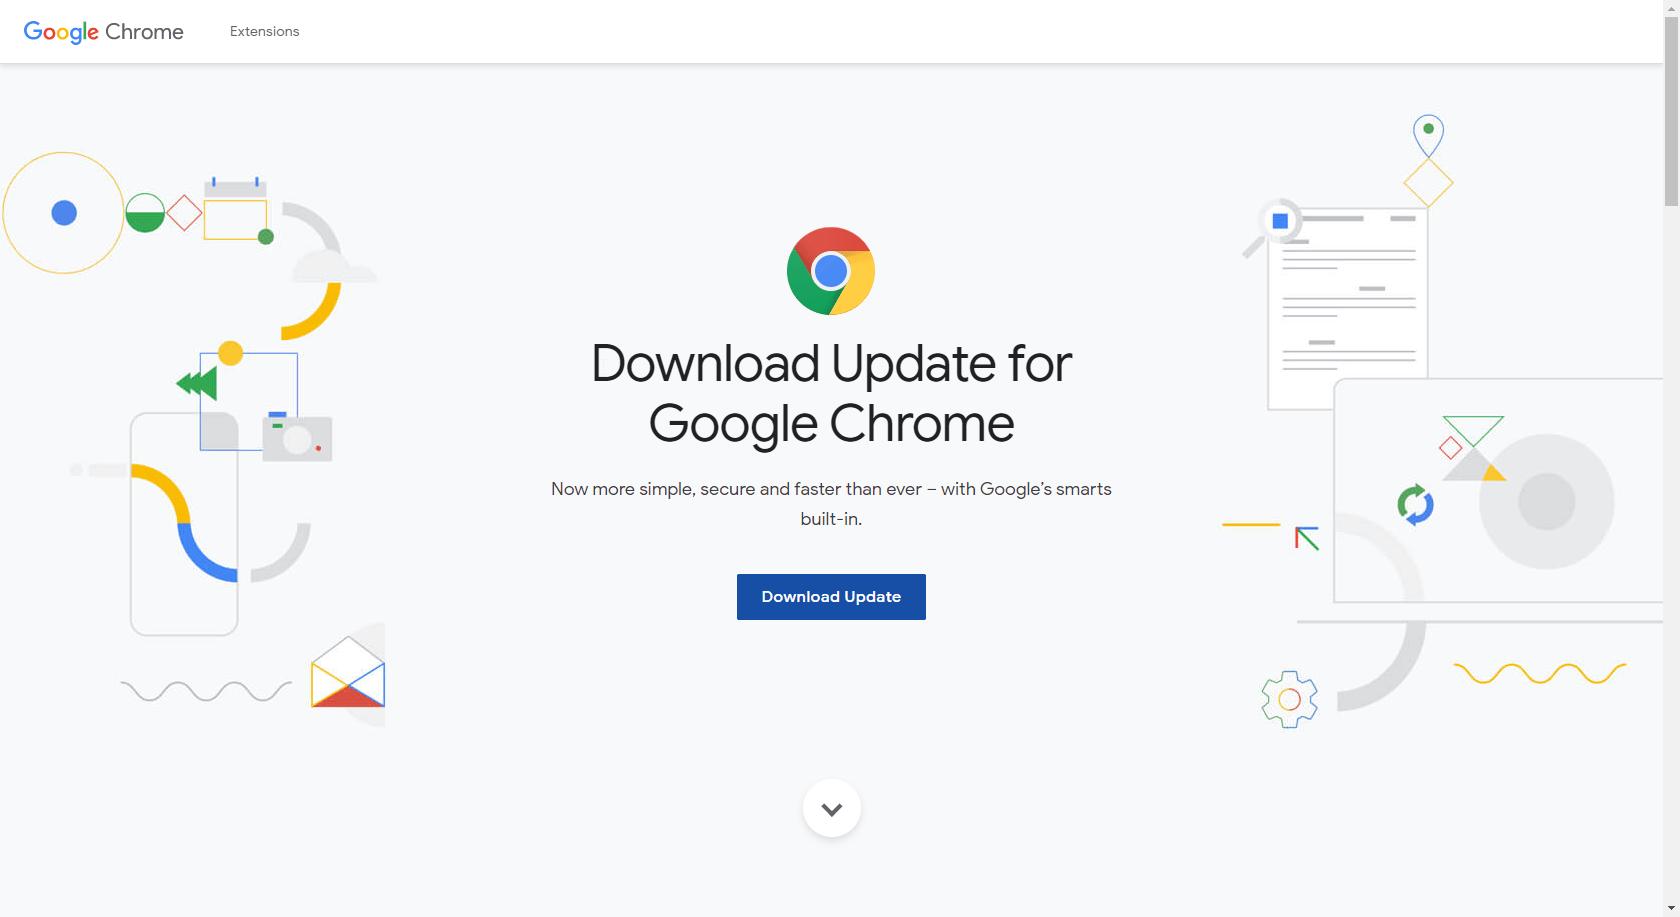 The Best Tips and Ticks for Optimizing Google Chrome